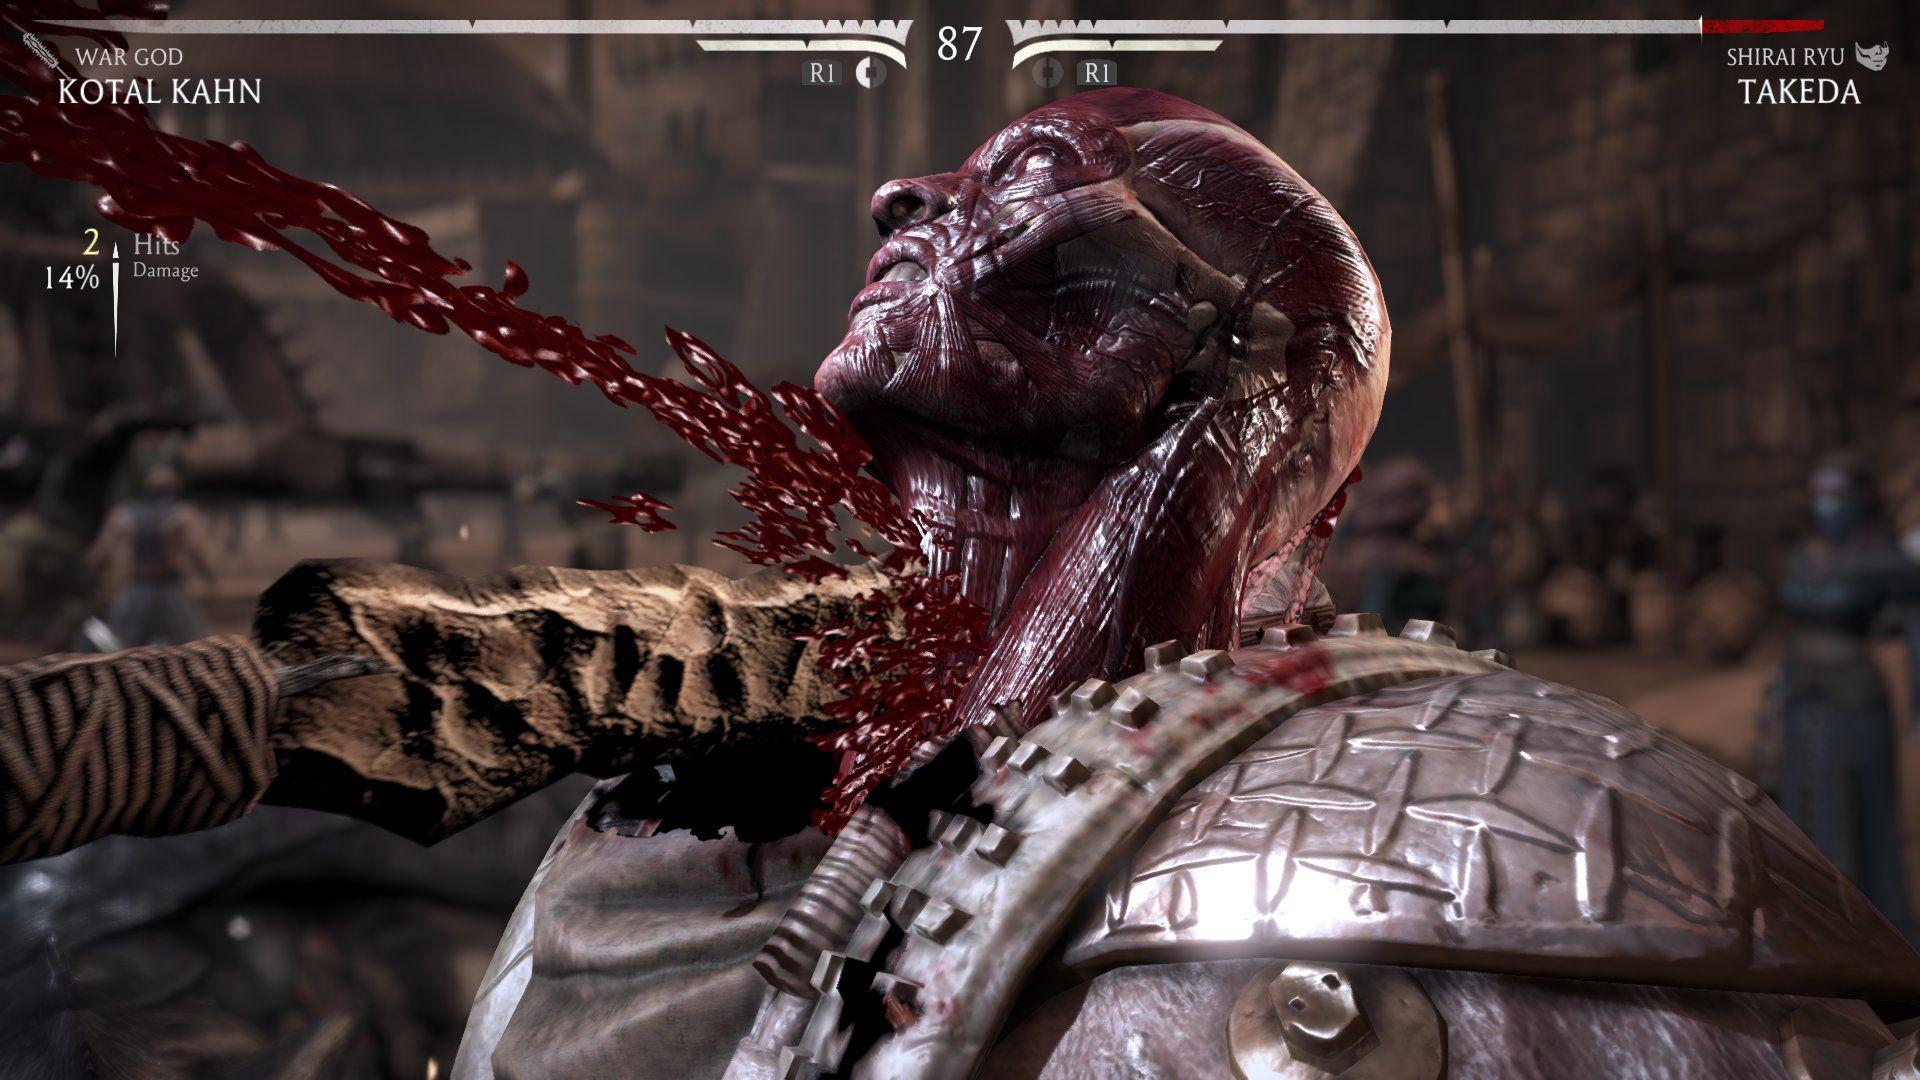 New Mortal Kombat Release Reviews and Models on newcarreleasebiz 1920x1080